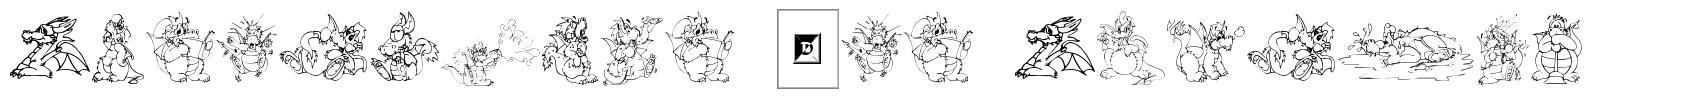 Delightful Lil Dragons font